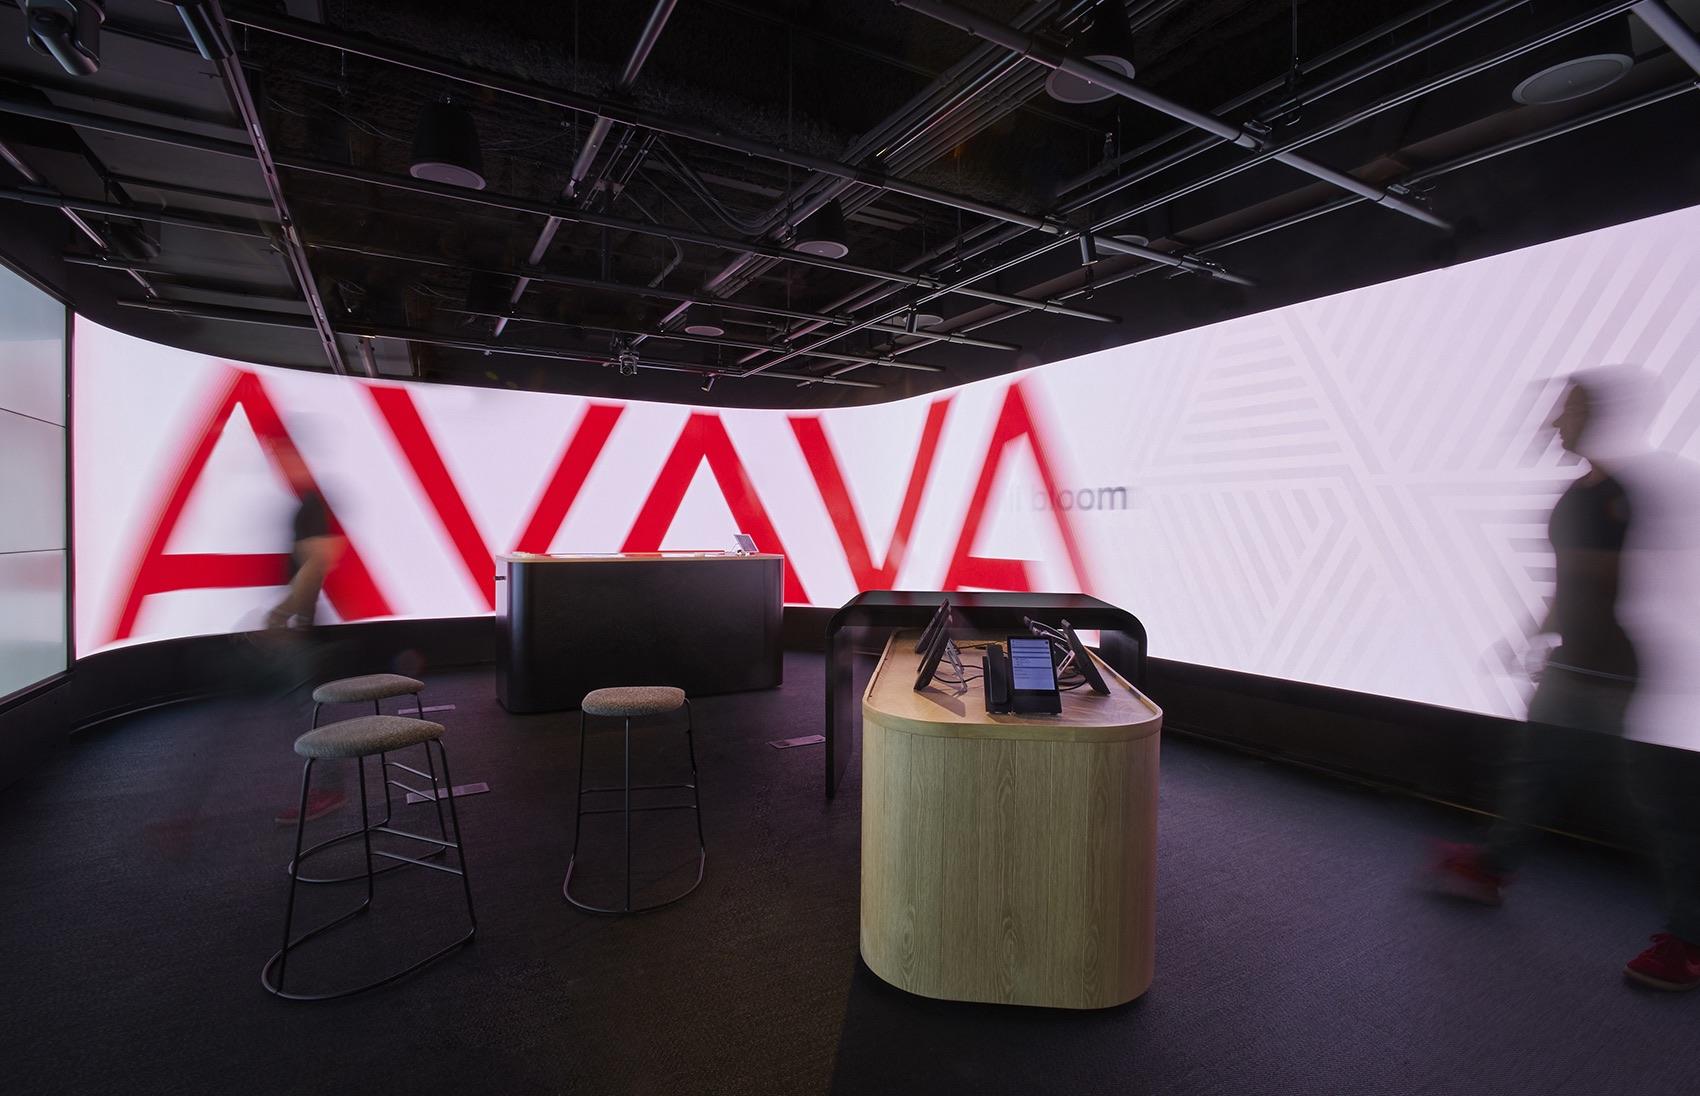 avaya-office-nyc-9